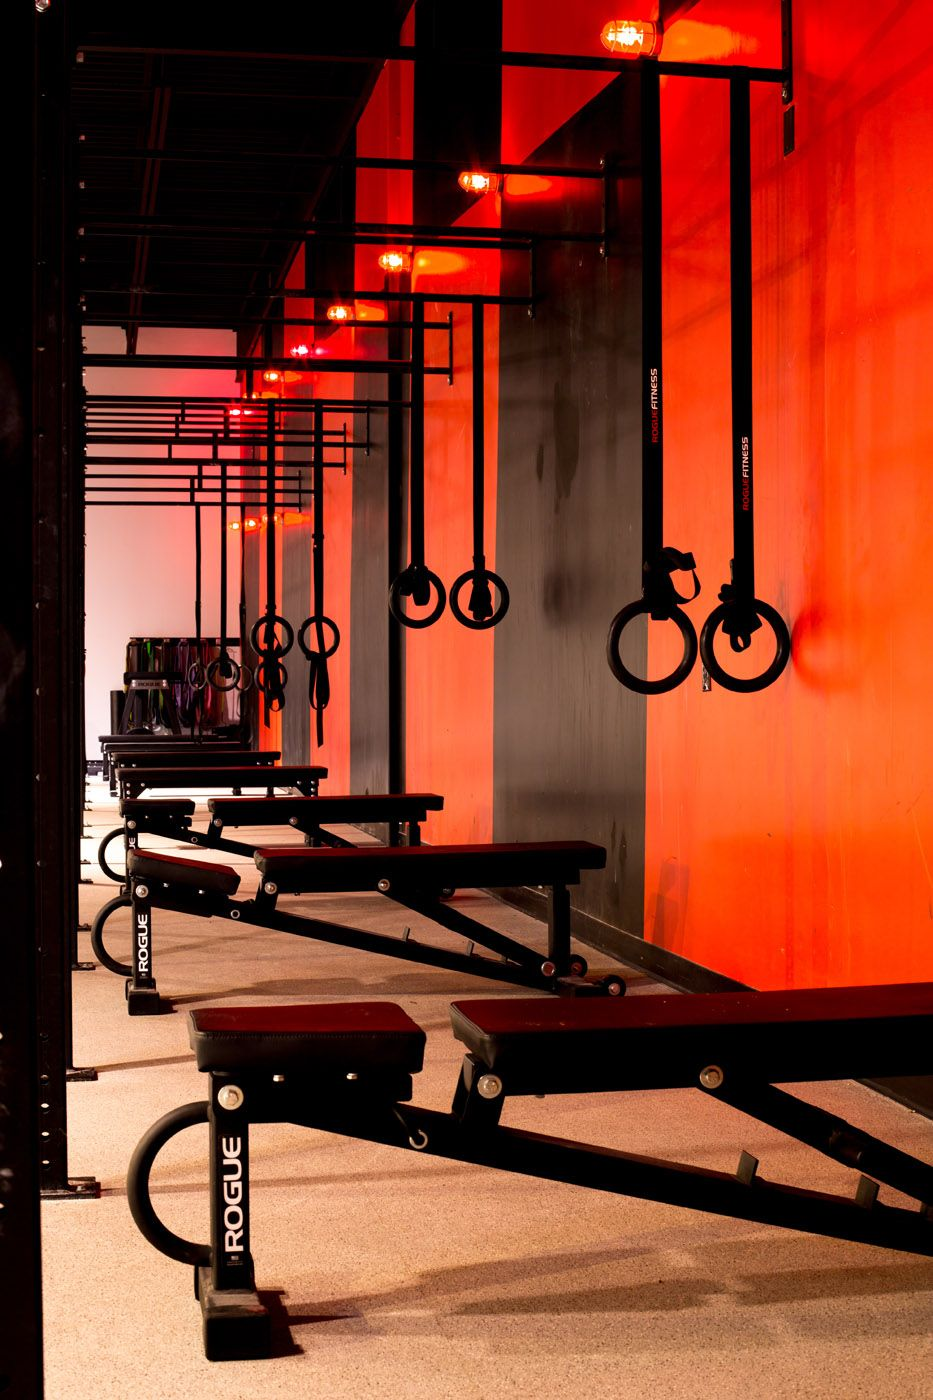 The new era of gym design fitnesscenterdesigndotcom